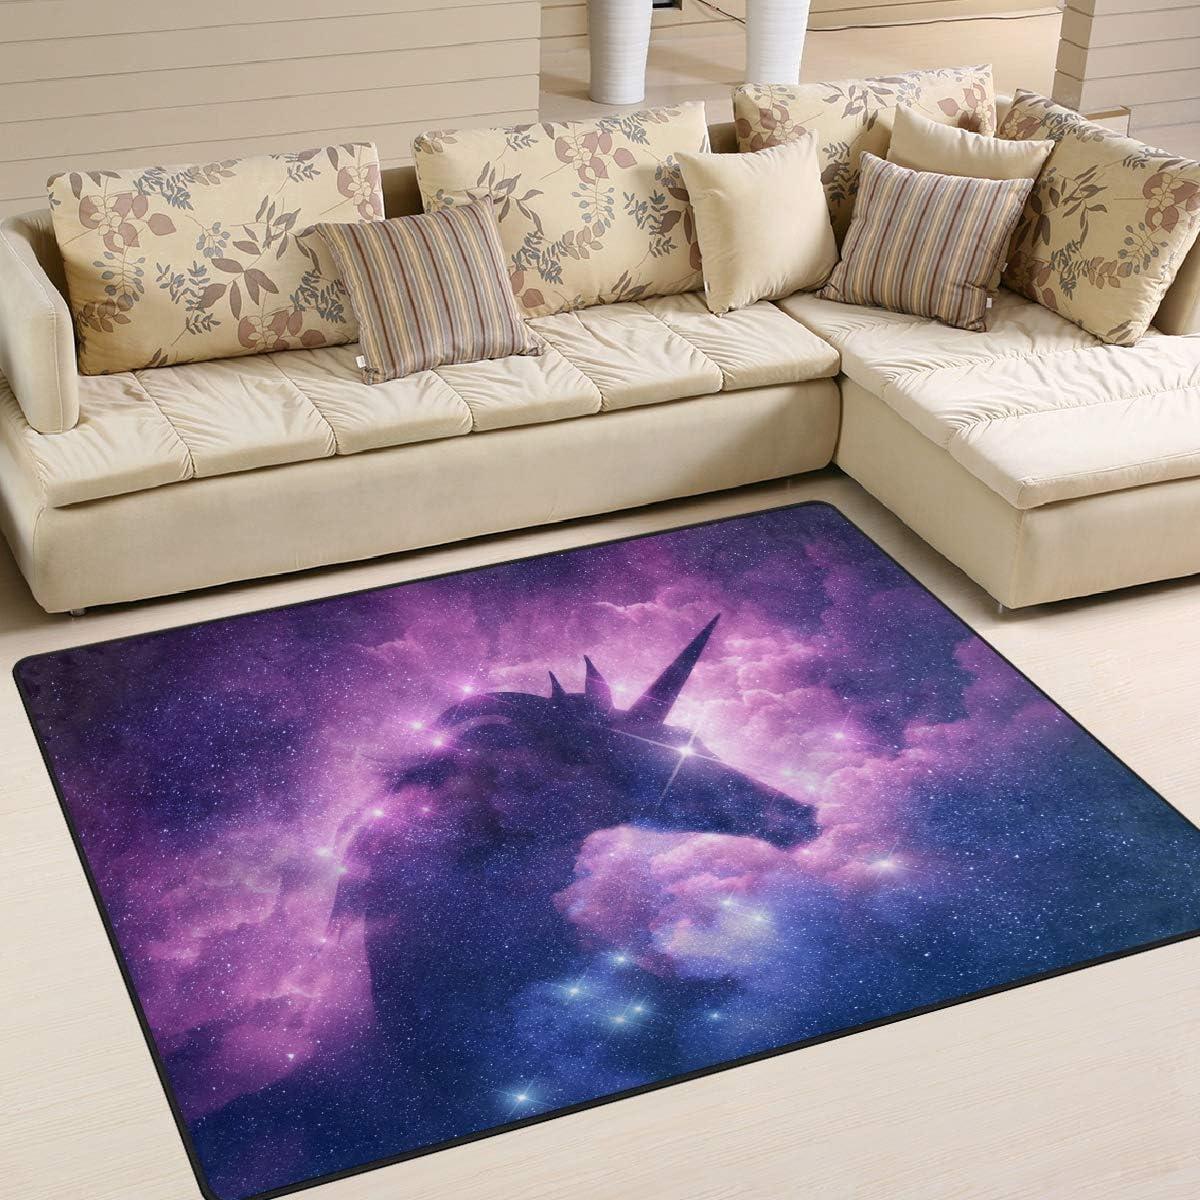 TropicalLife Abstract Galaxy Space Unicorn Area Rug 4 x 5 Mat Home Decor